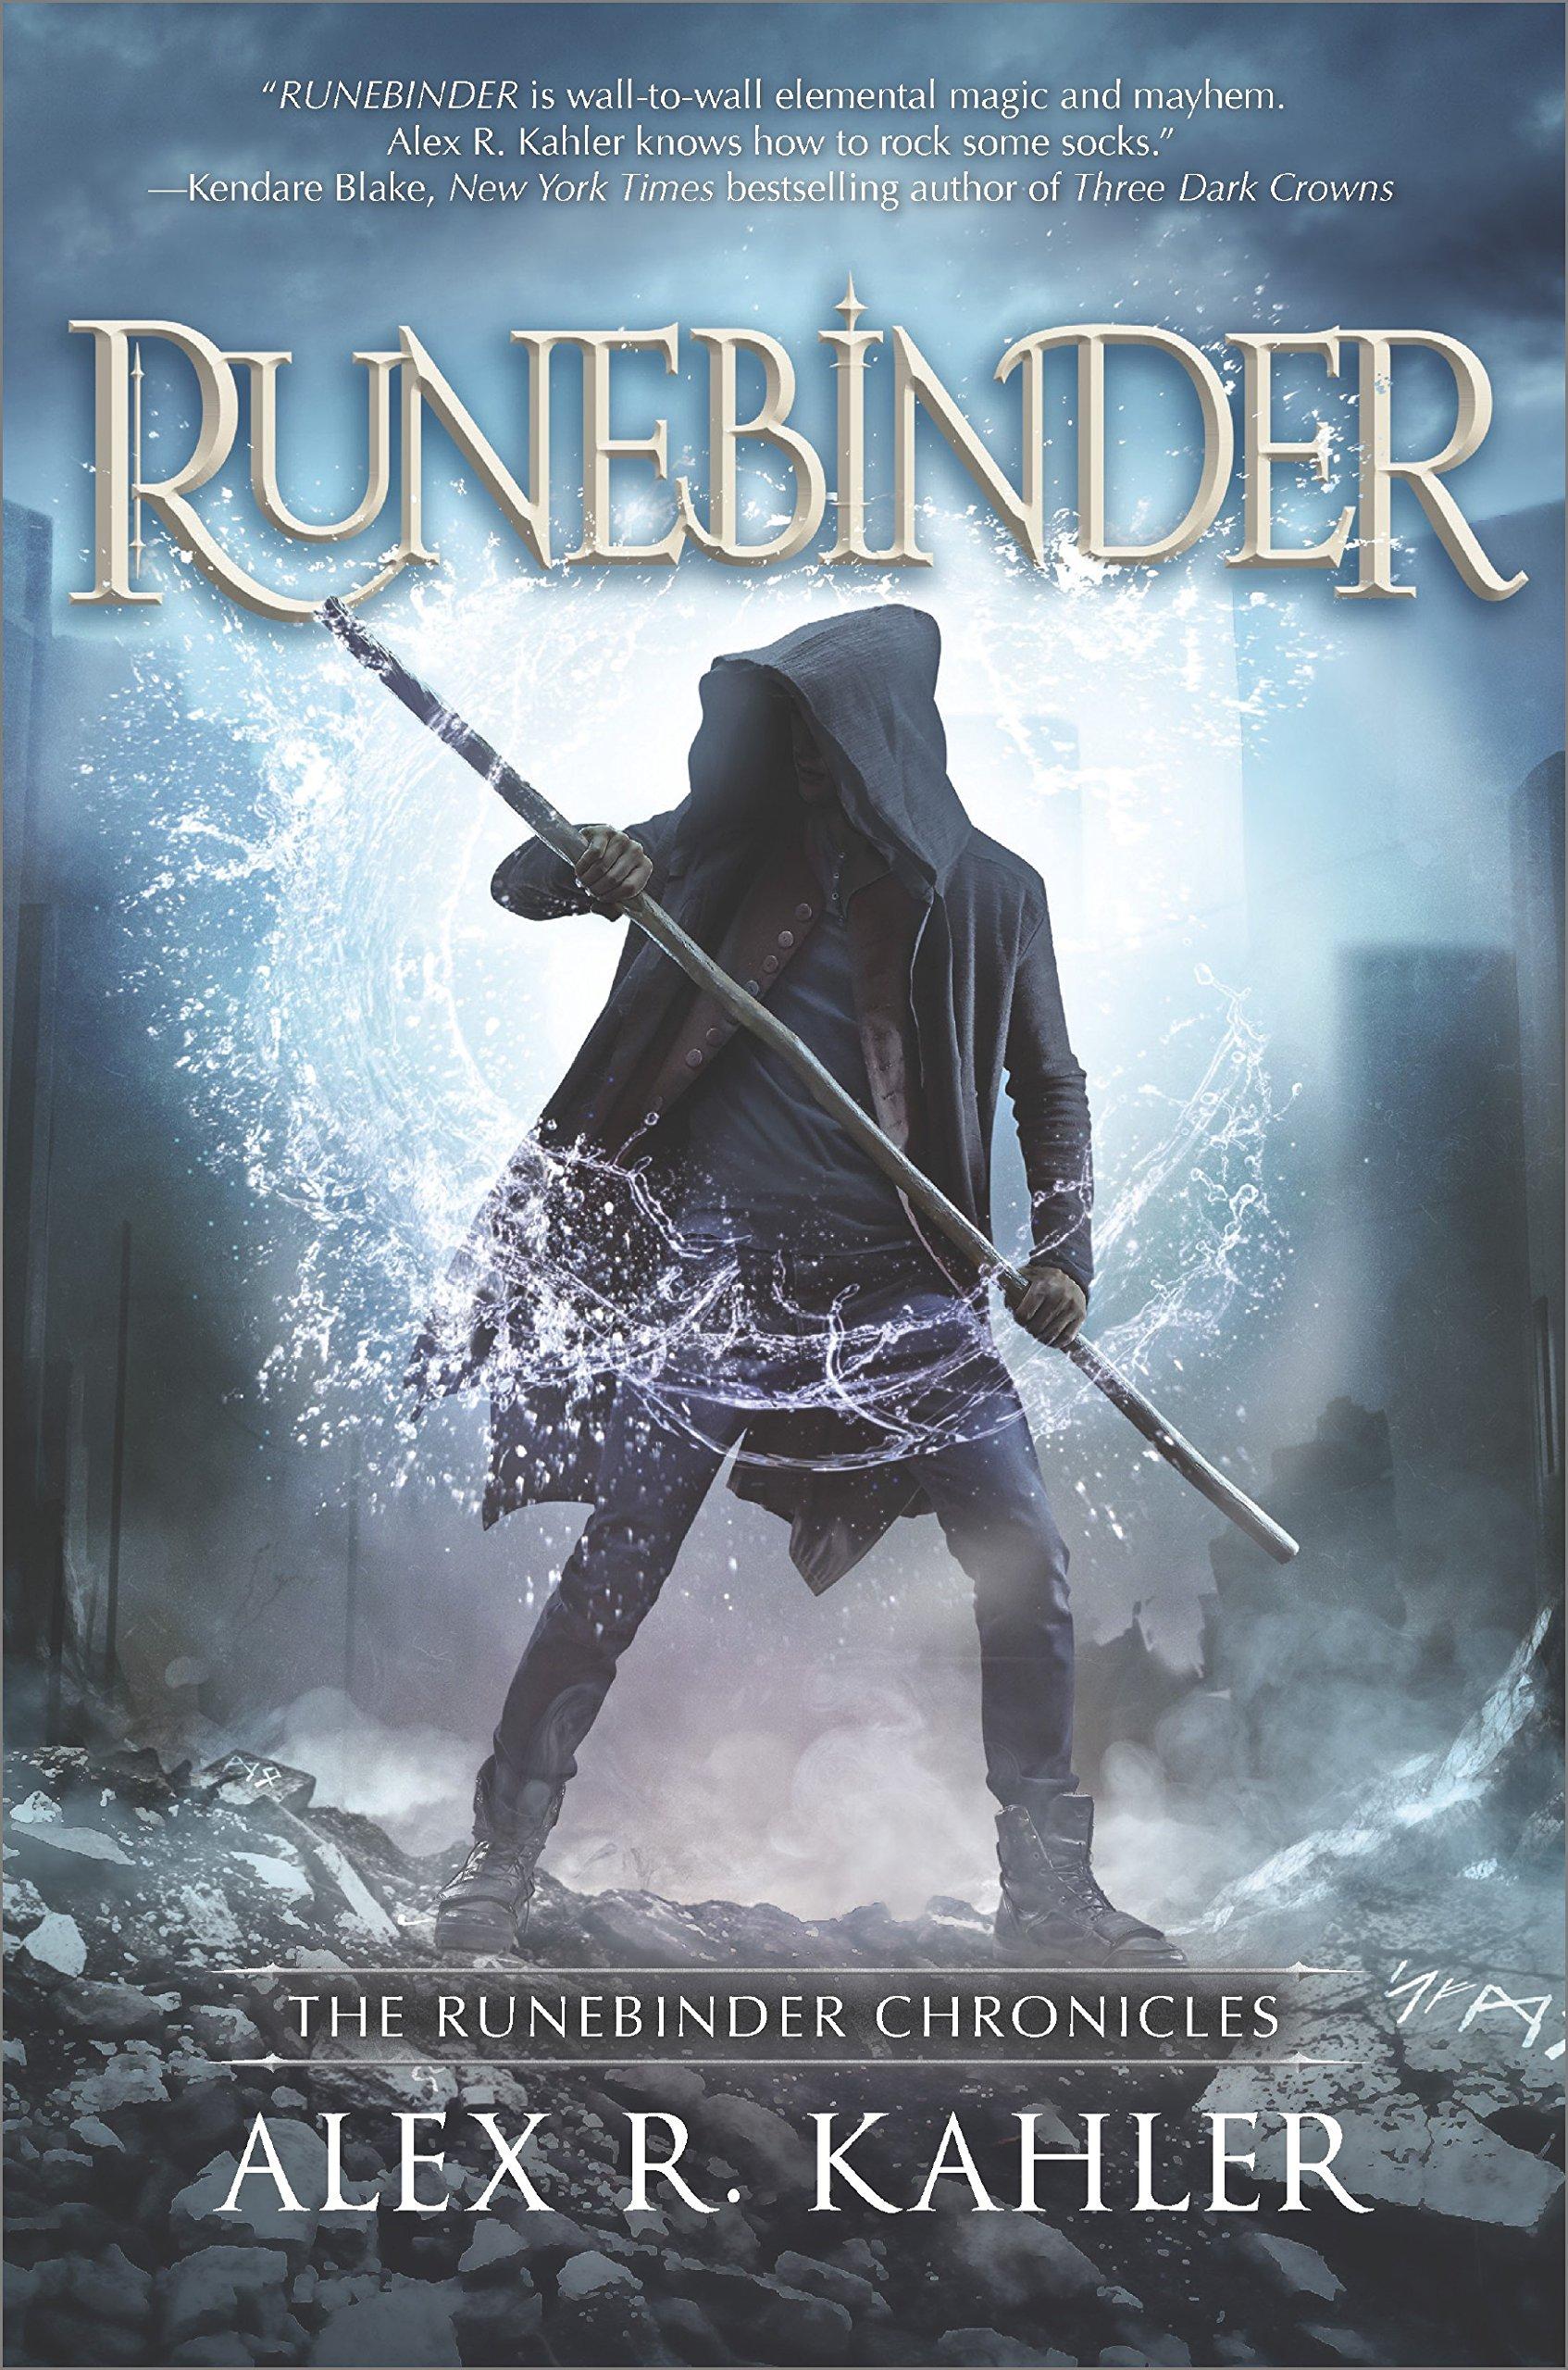 Review – Runebinder by Alex R. Kahler